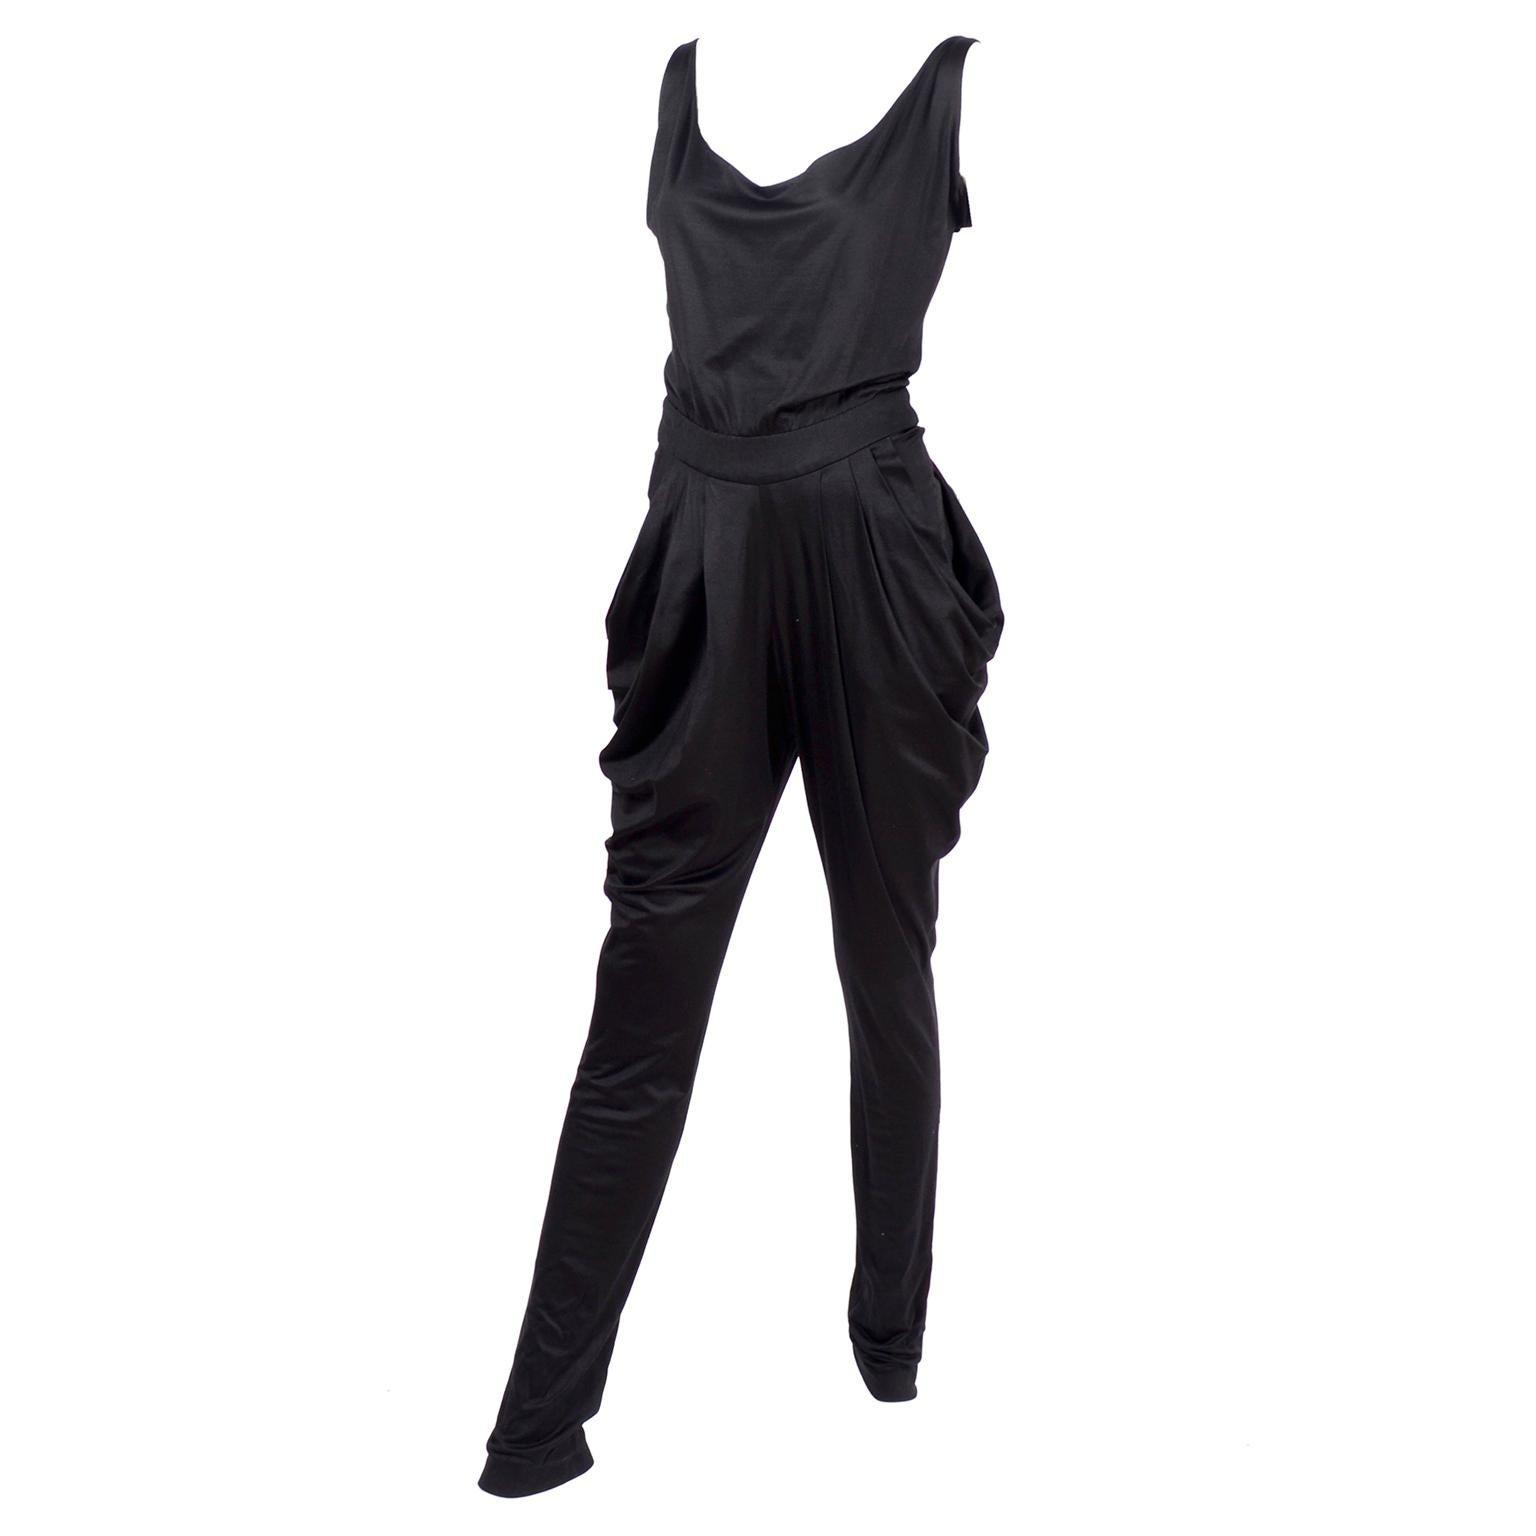 1980s Vintage Harem Style Black Jumpsuit With Gathering & Pockets w/ Low Back